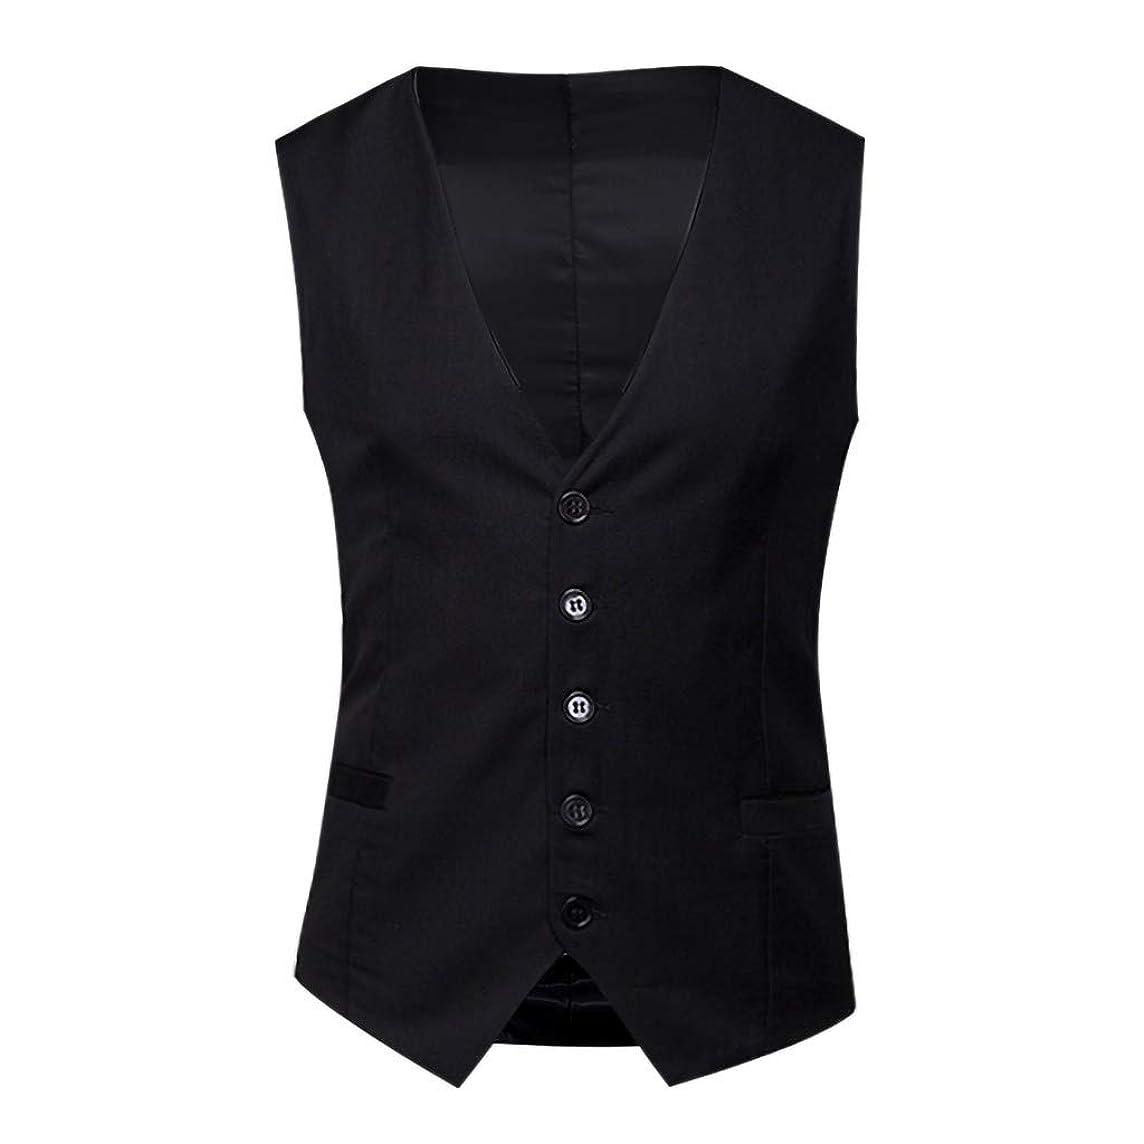 iHPH7 Men's Tank Tops Sleeveless T-Shirt #19052708